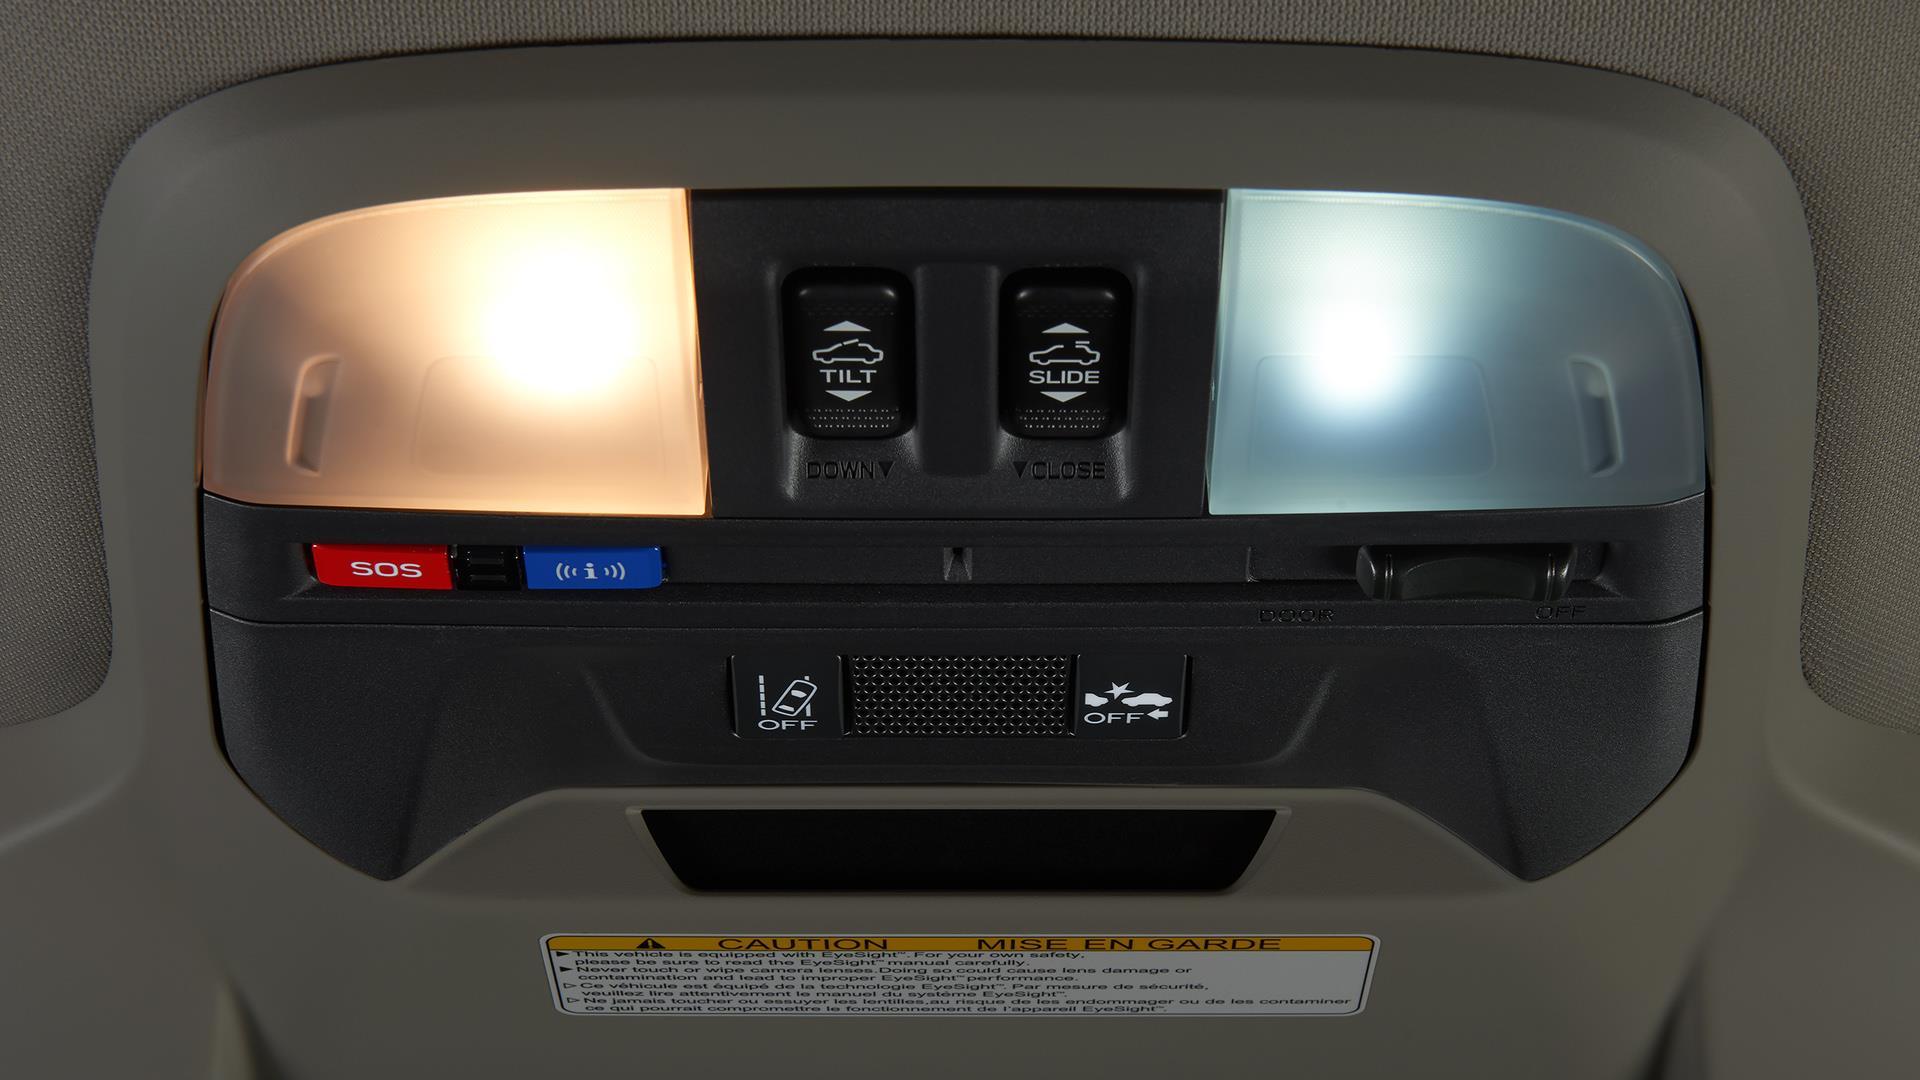 2018 subaru crosstrek led upgrade map and dome lights - Subaru crosstrek interior lighting ...